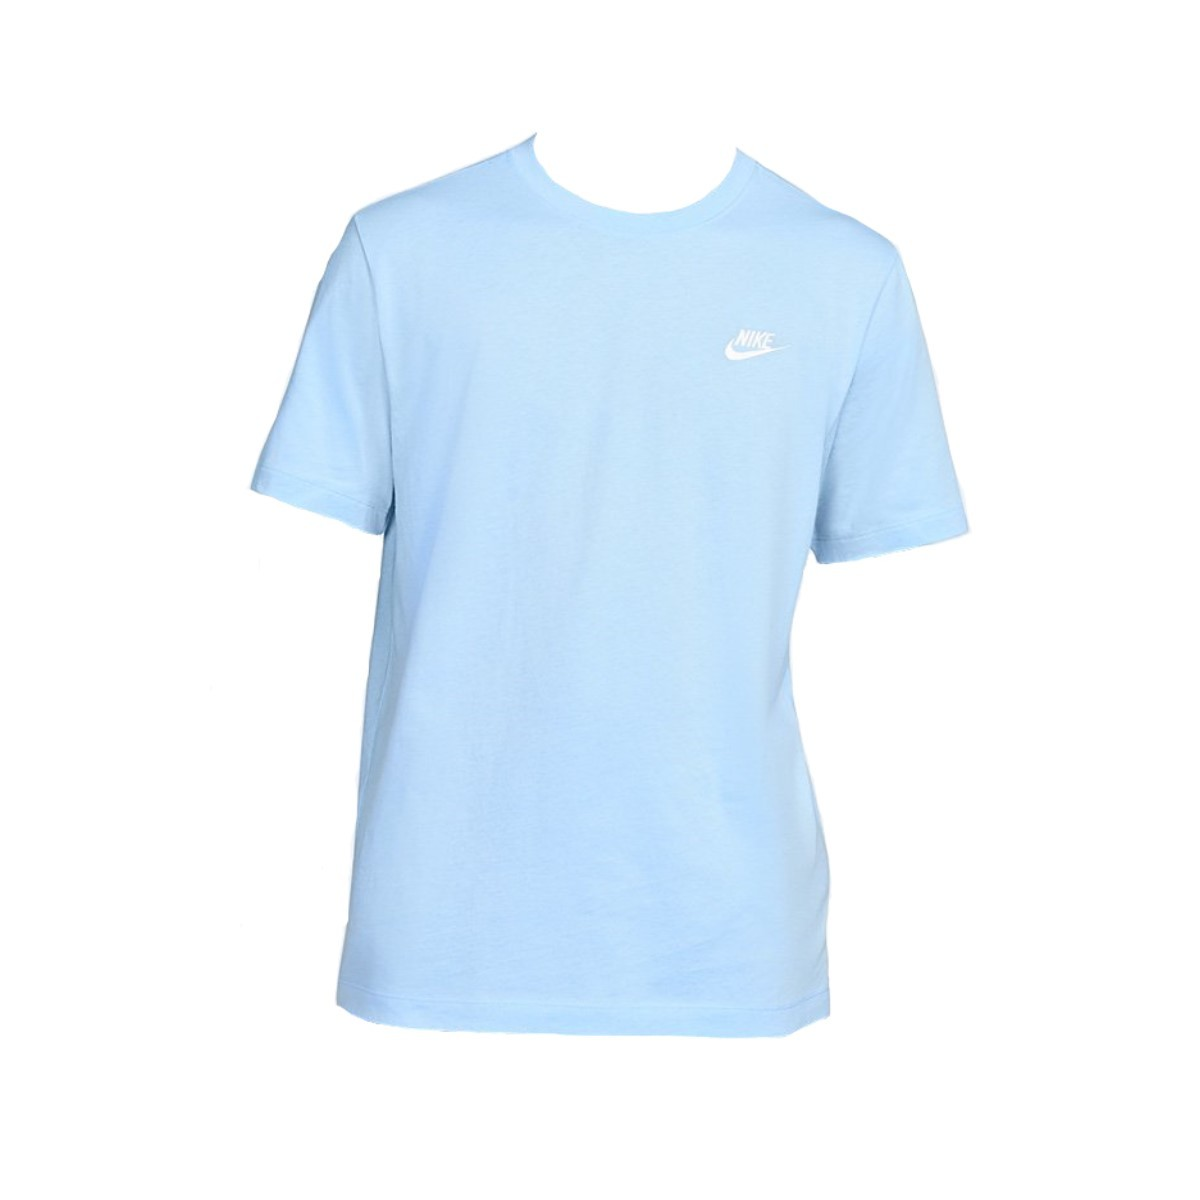 Camiseta Nike Club Tee Azul Claro e Branco - Masculino